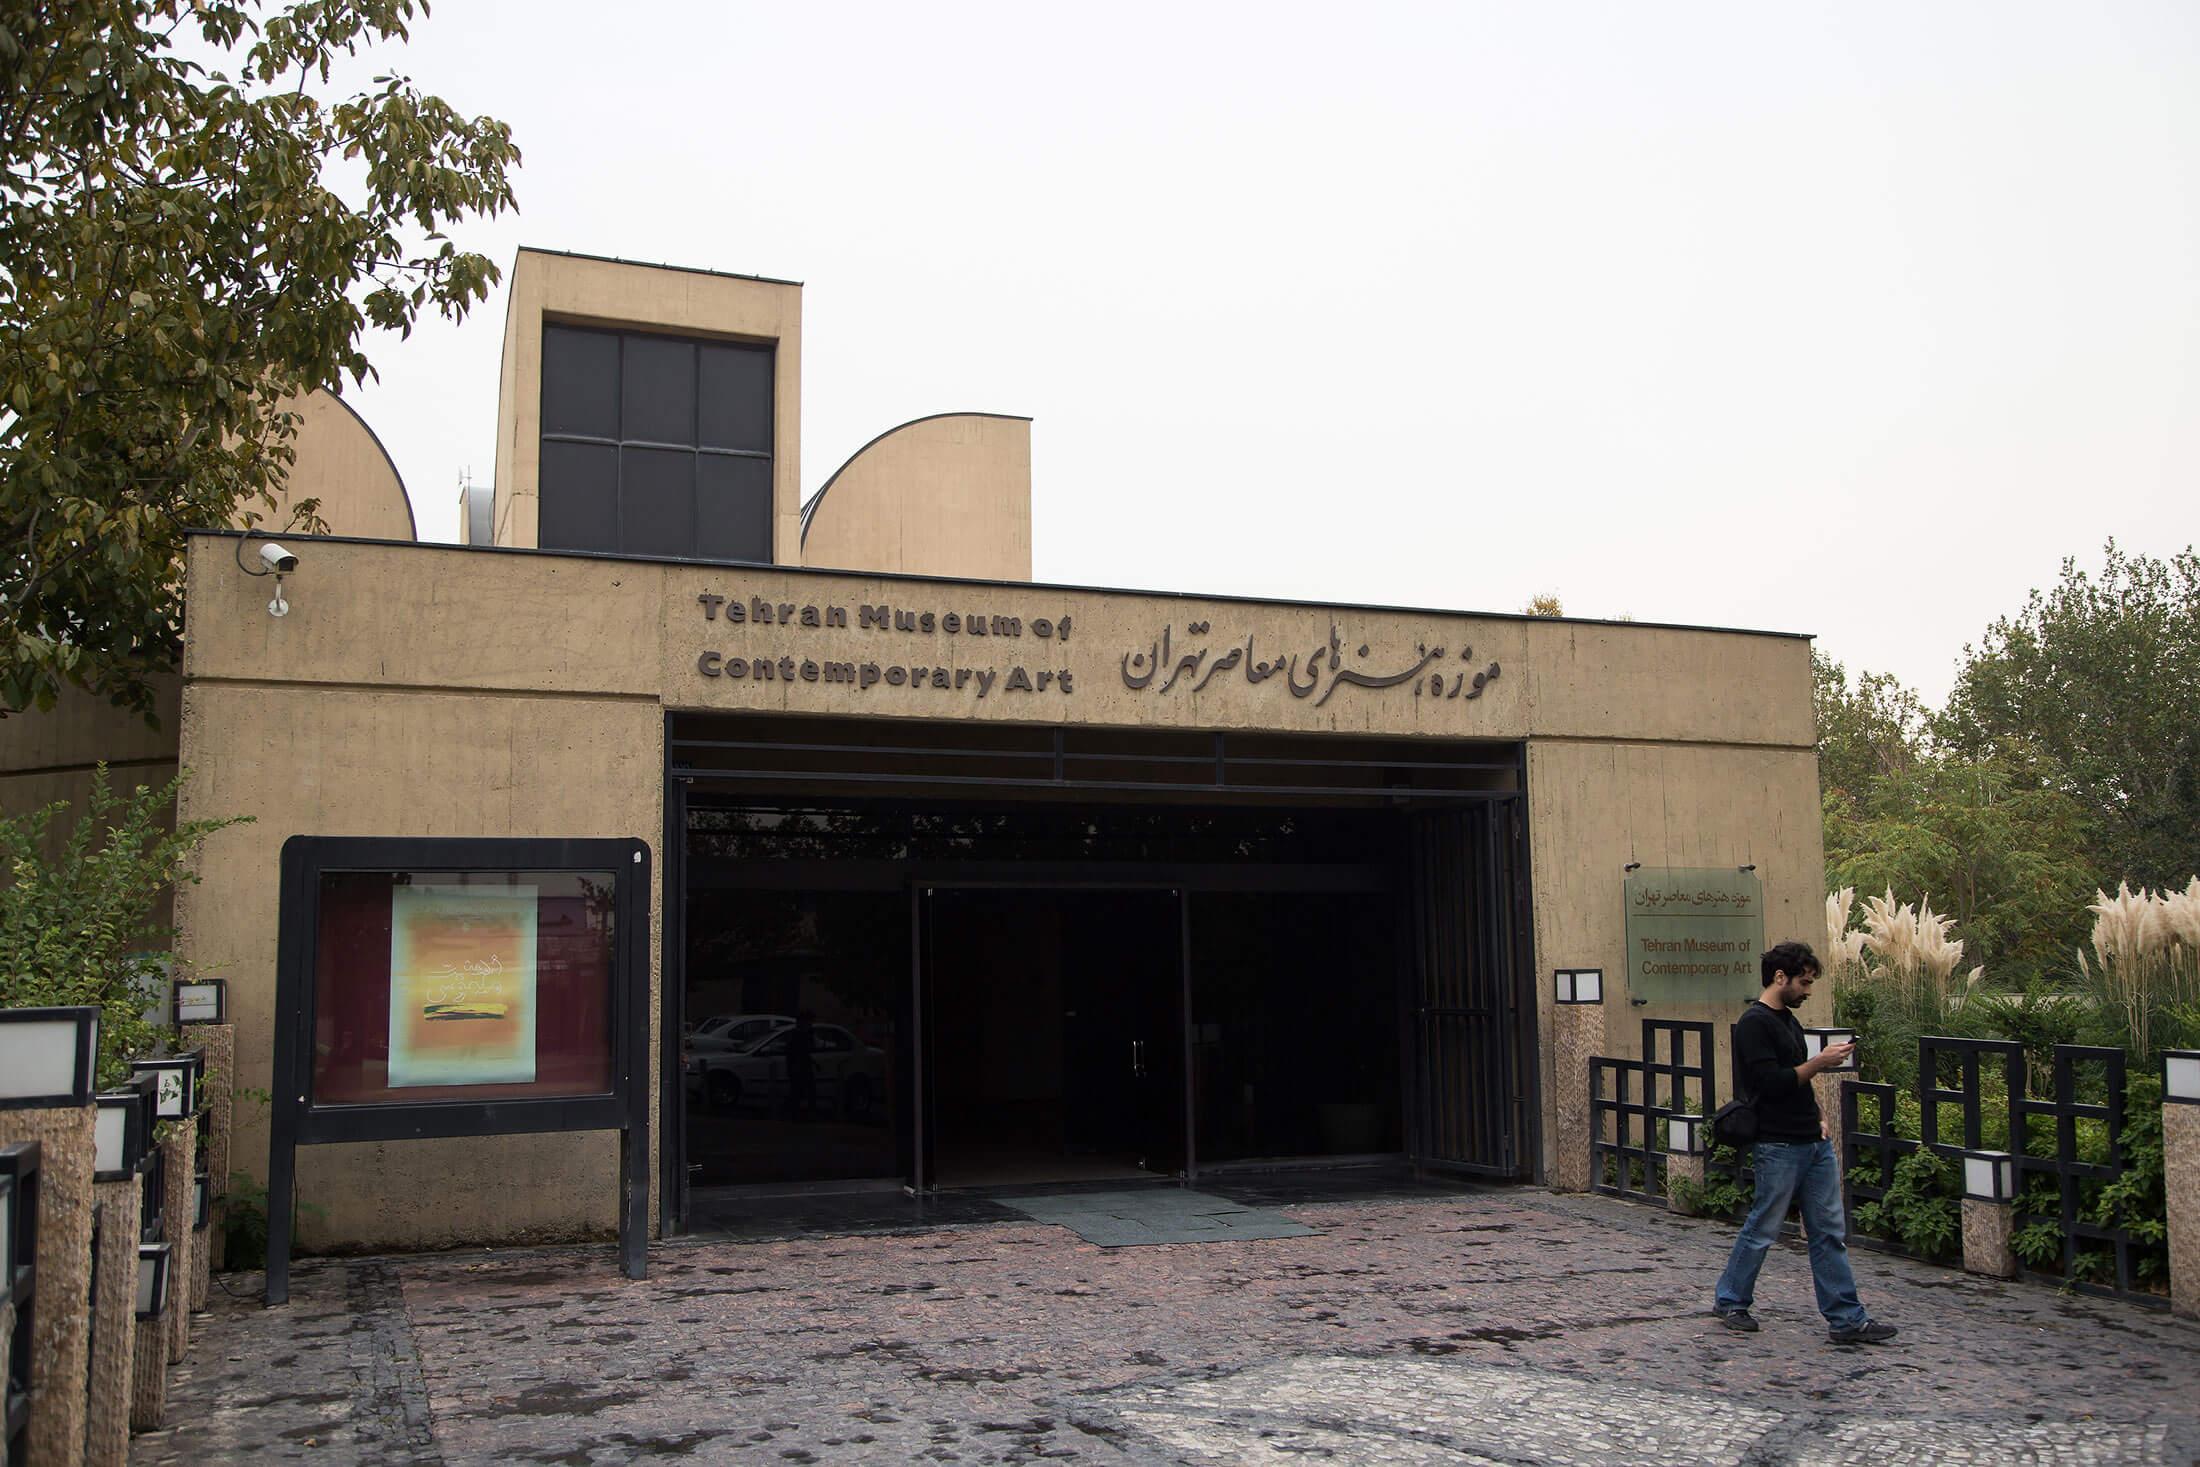 Kunstmuseum Teheran, Museum für Zeitgenössische Kunst